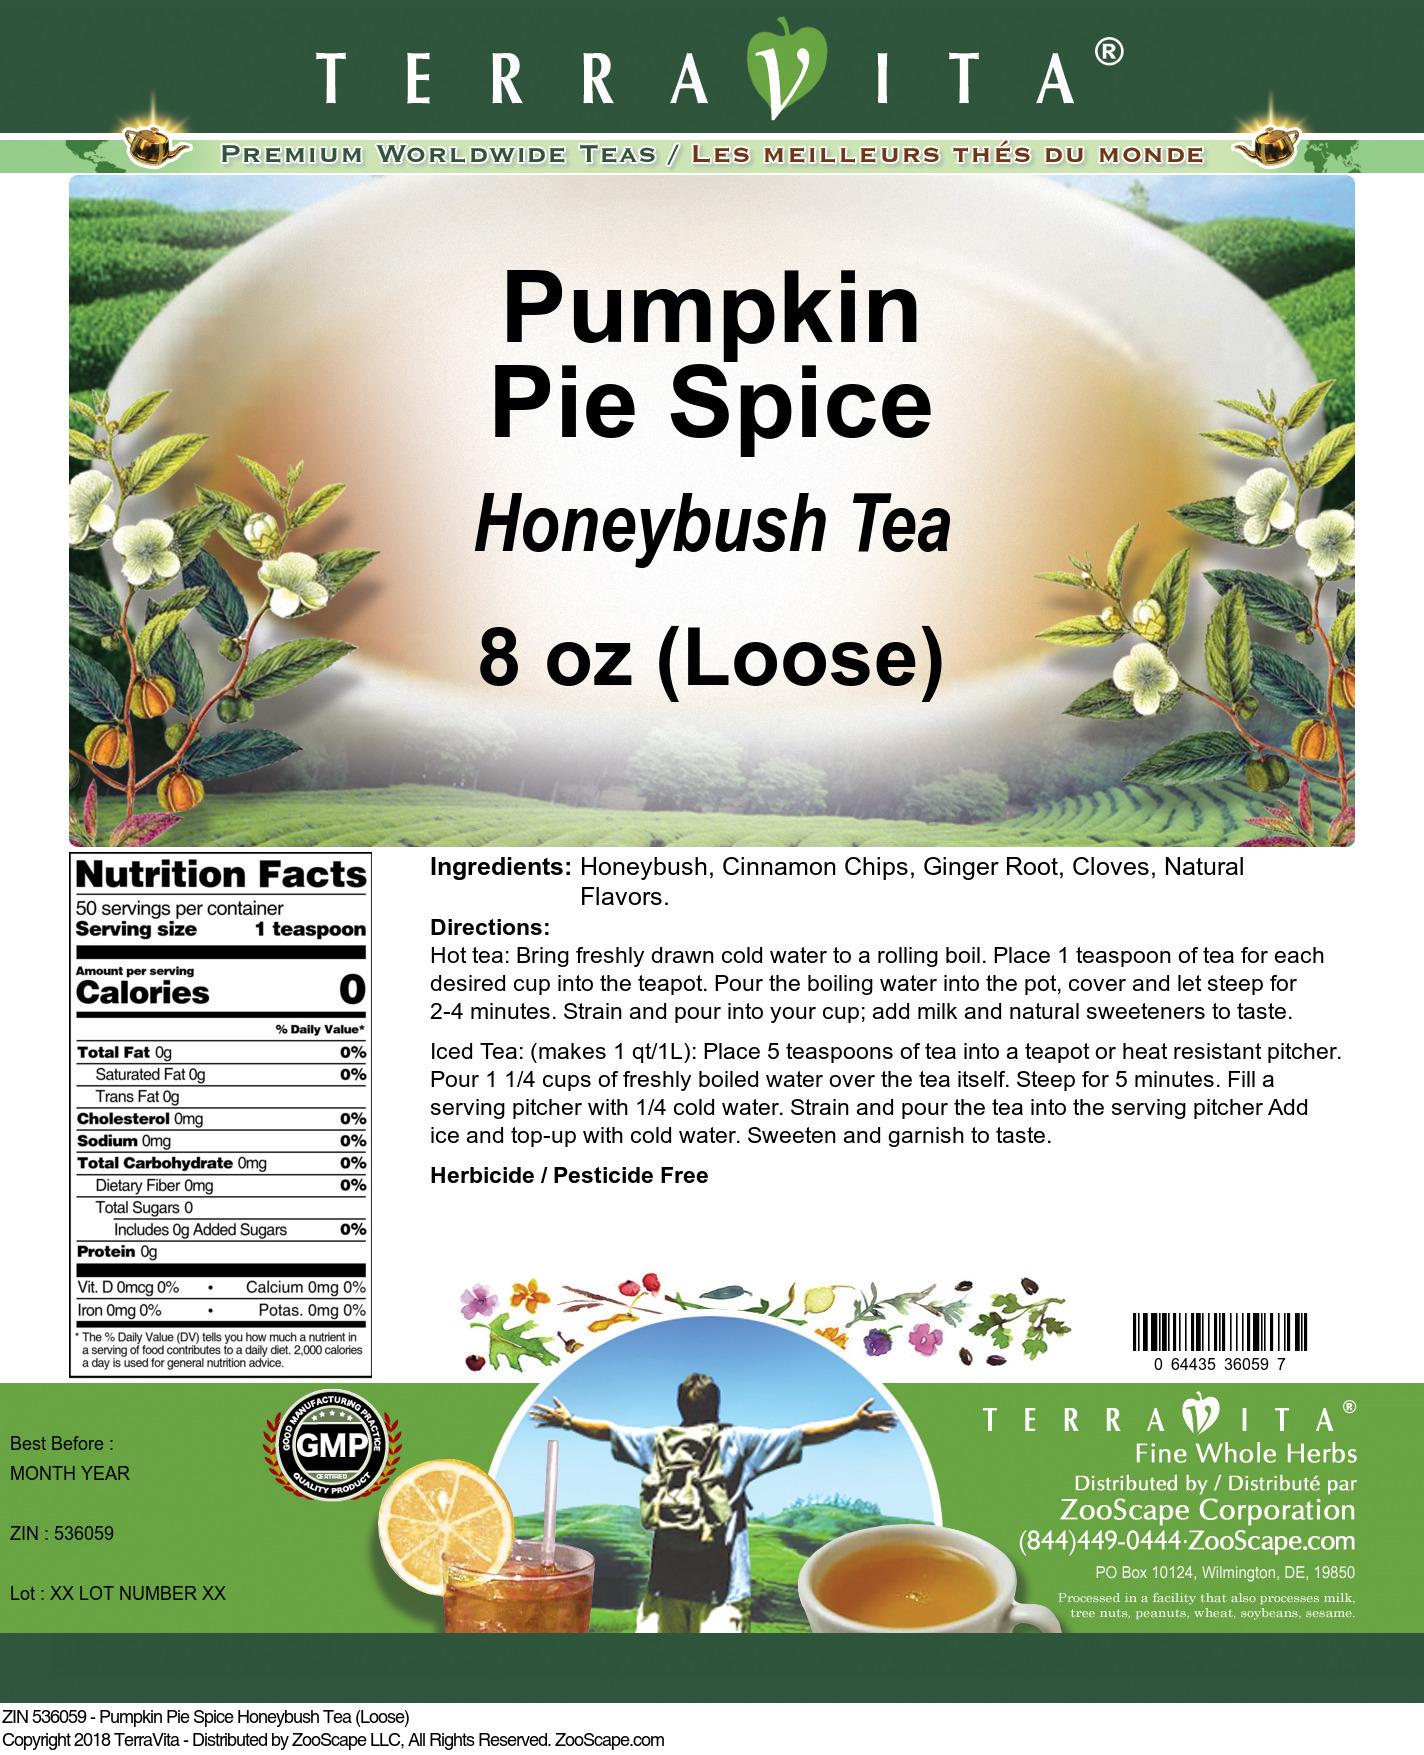 Pumpkin Pie Spice Honeybush Tea (Loose)